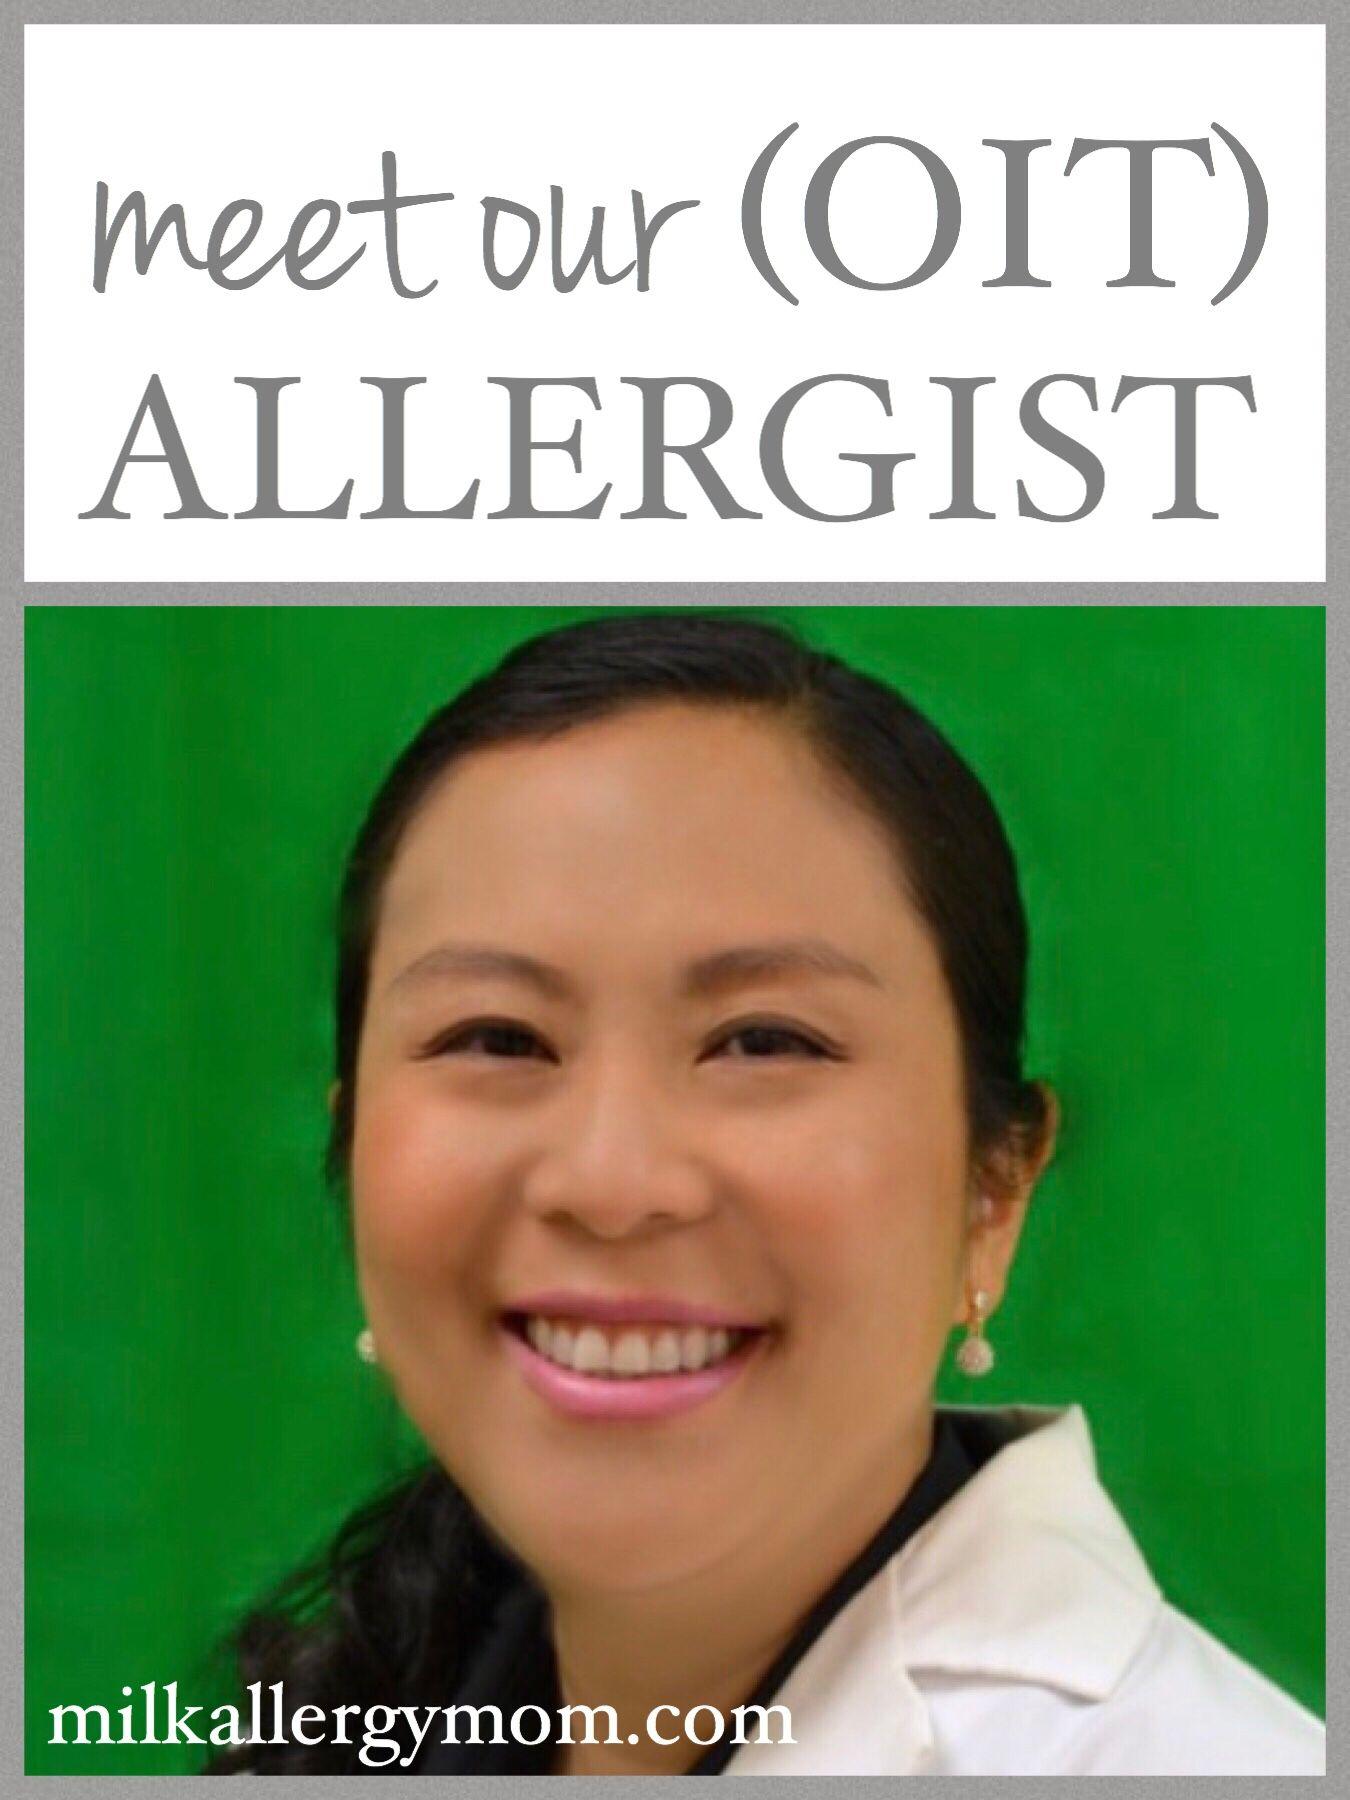 Allergist Immunologist Board Certified Oit Doctor Milk Allergy Mom Allergy Mom Milk Allergy Milk Allergy Mom